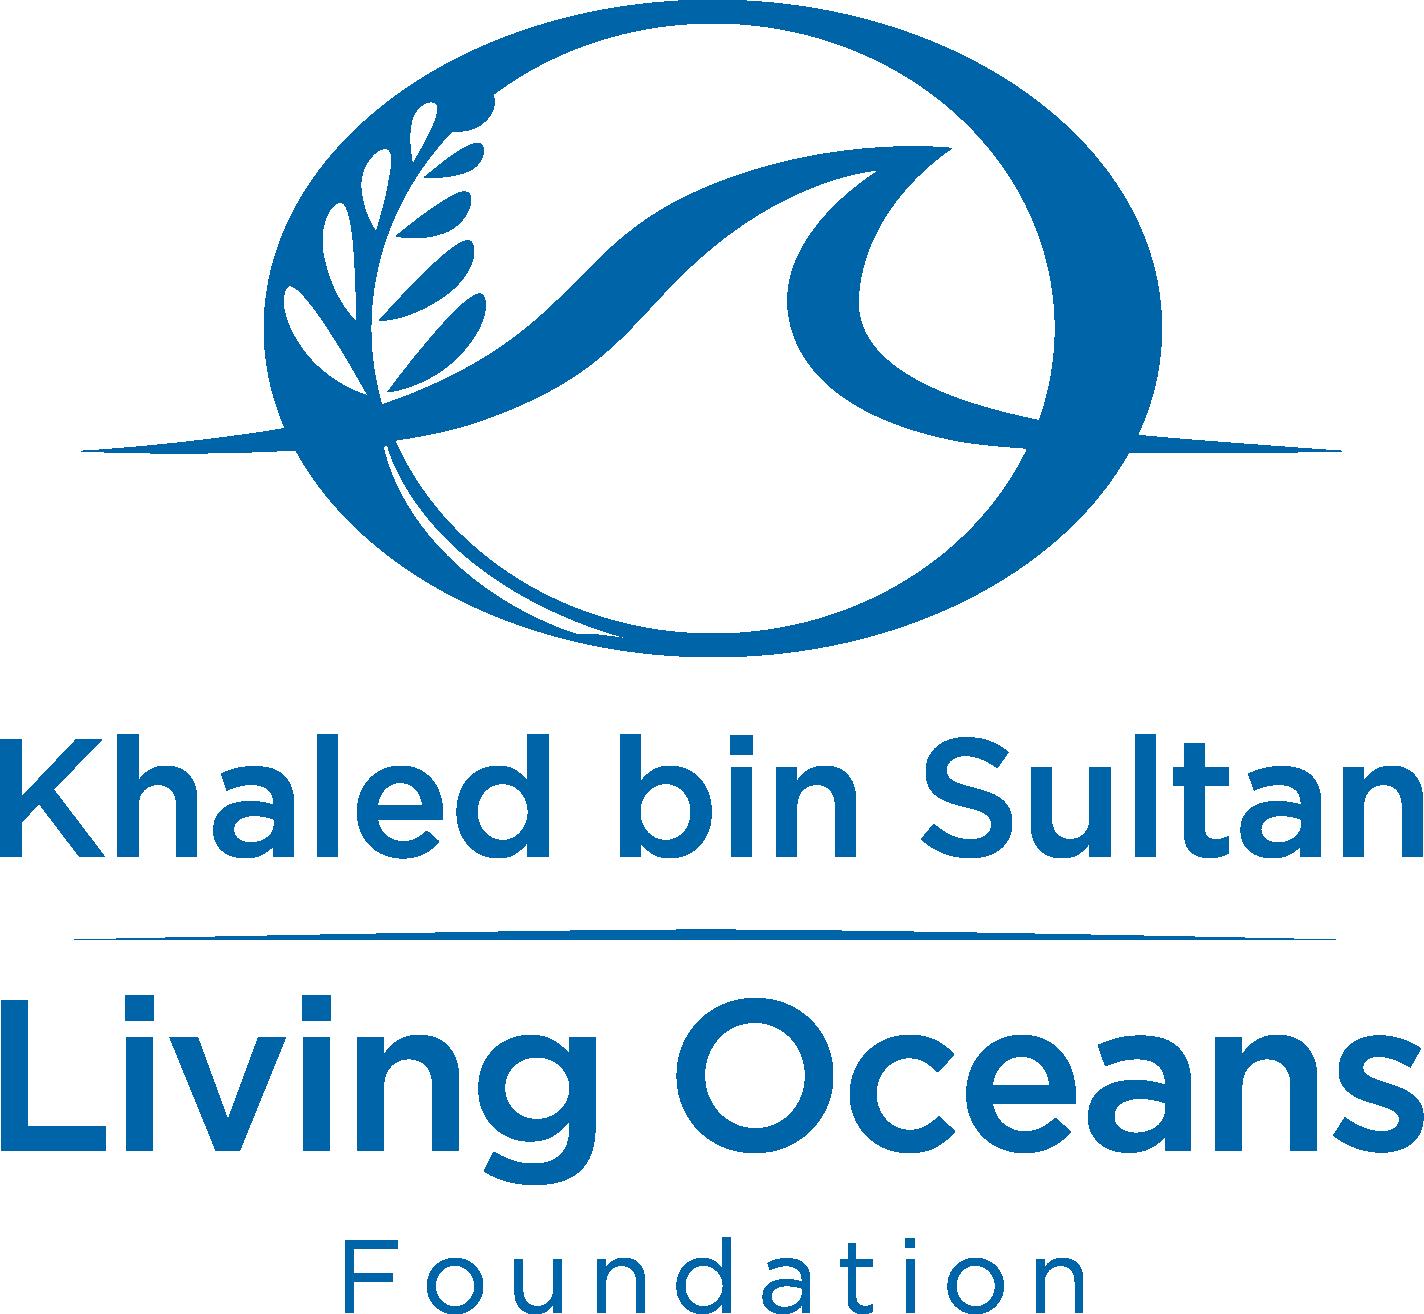 Khaled bin Sultan Living Oceans Foundation logo